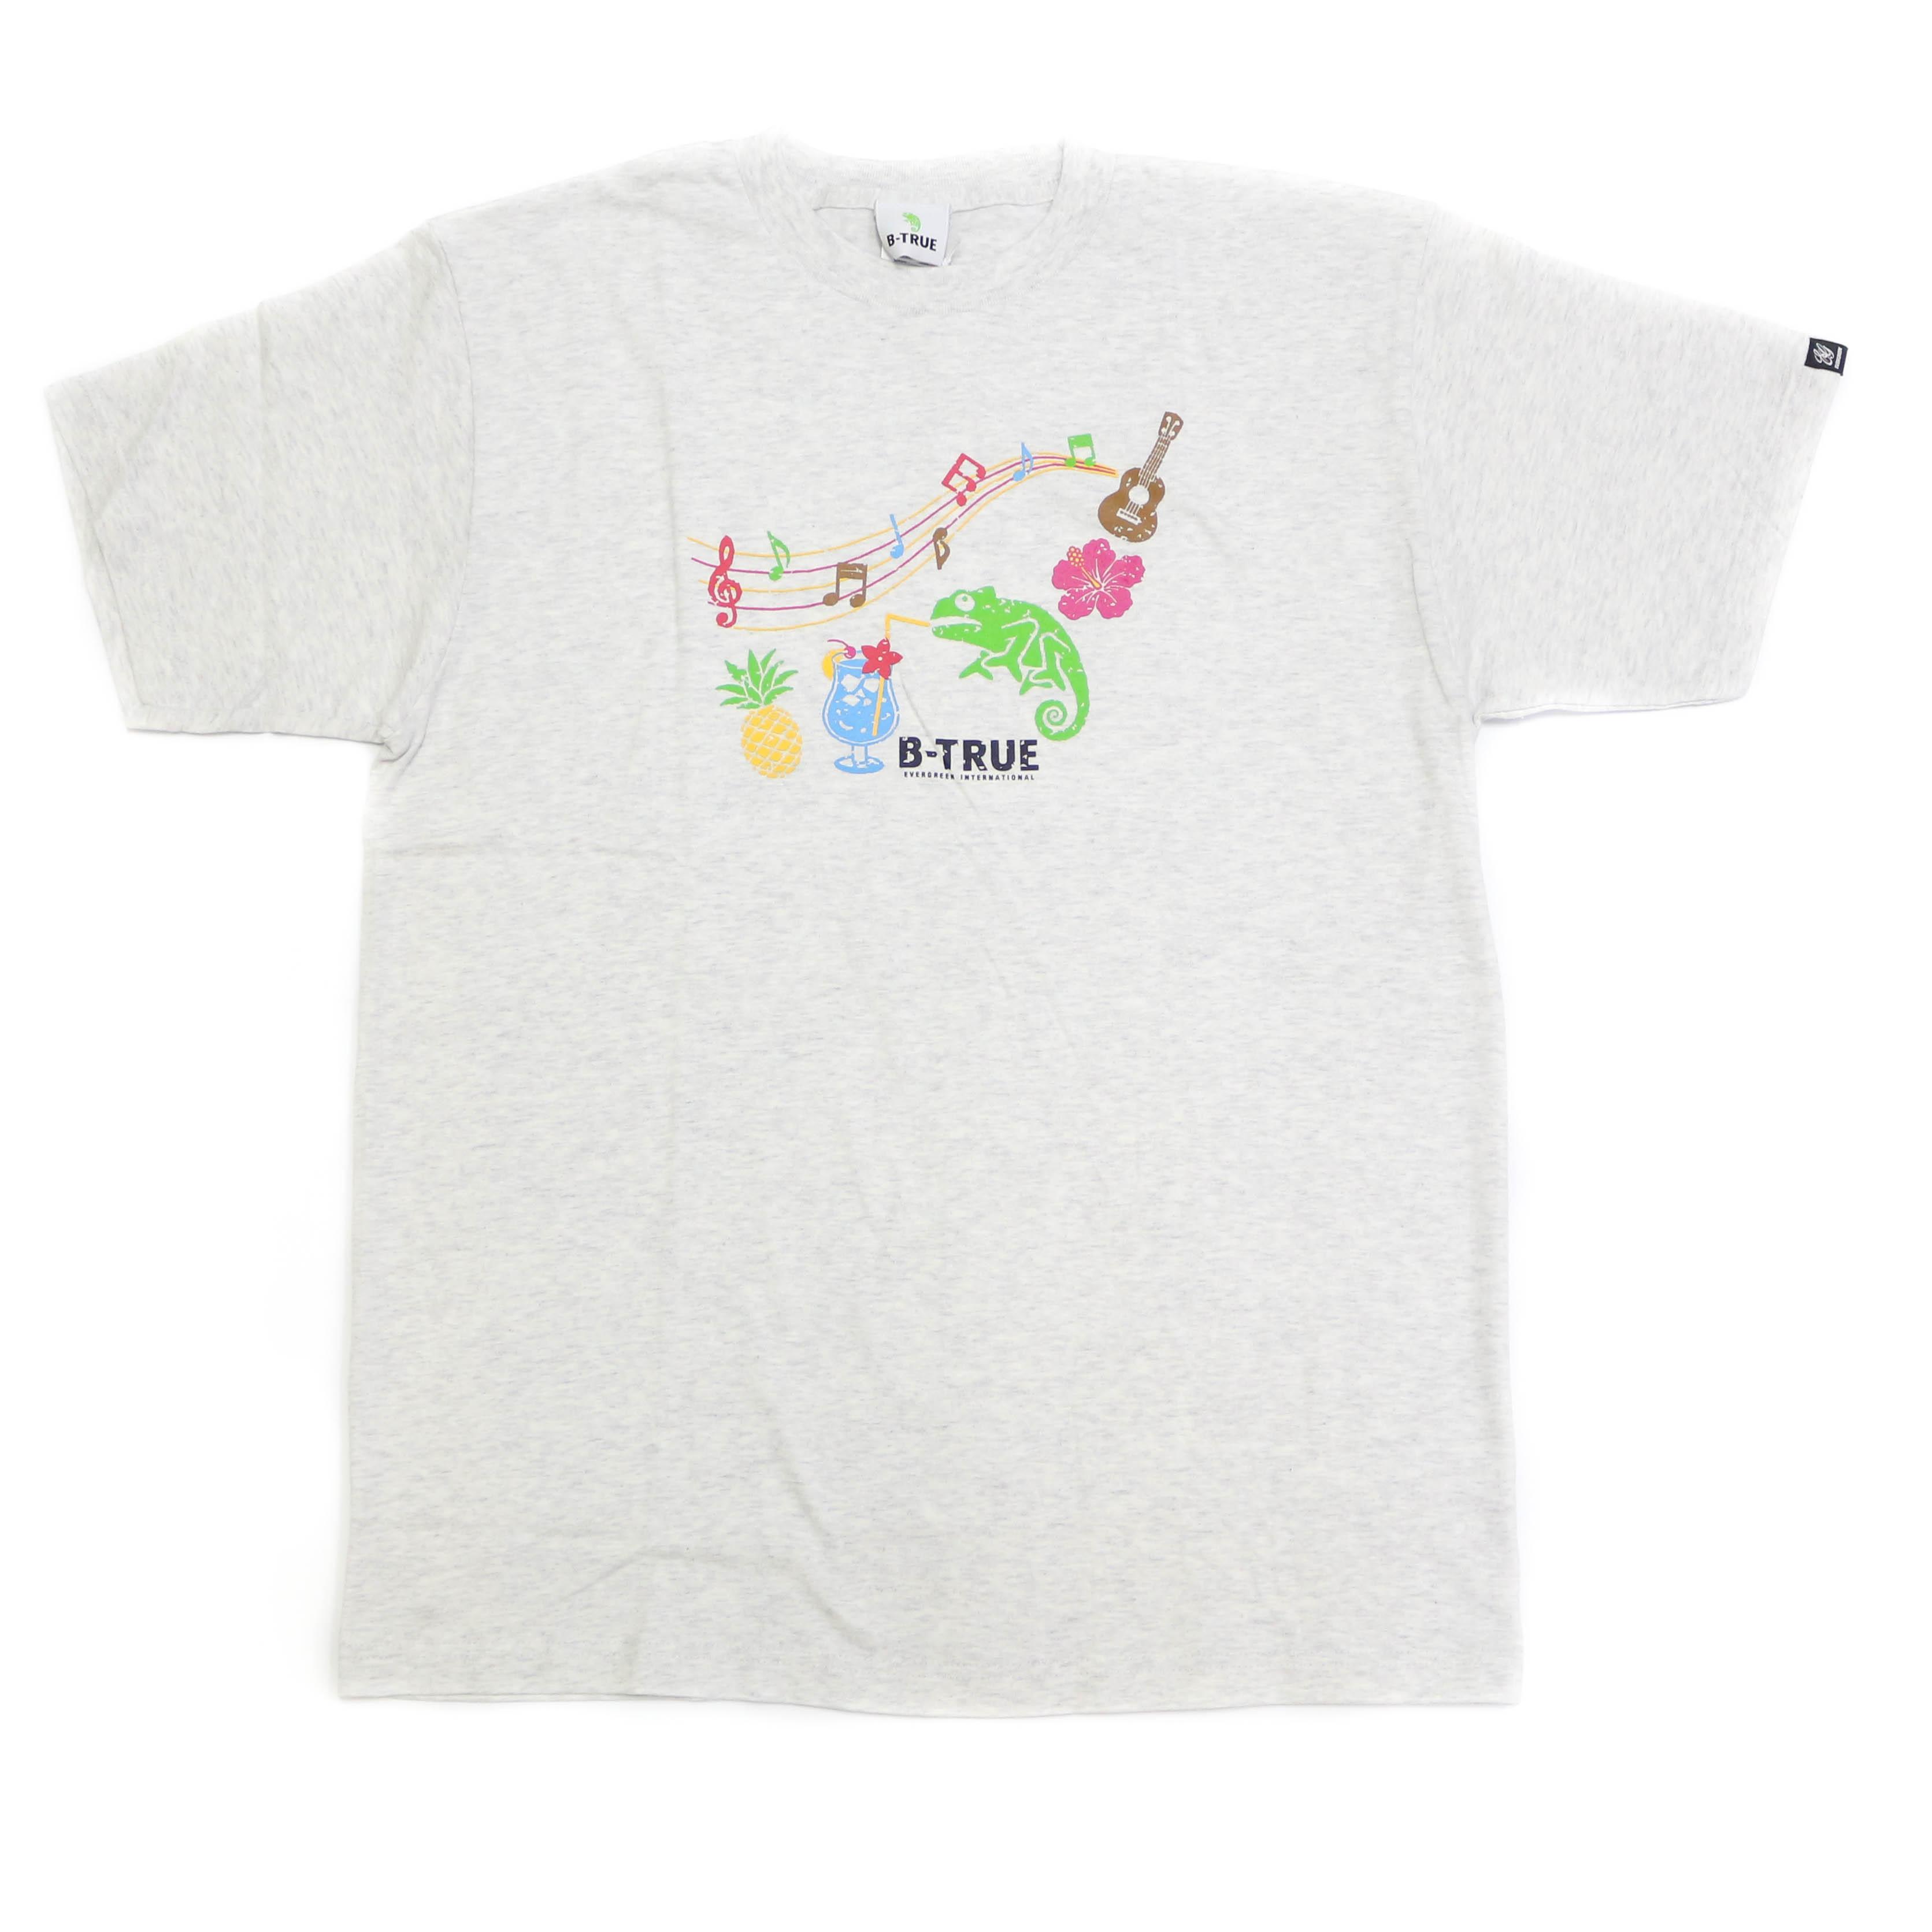 Sale Evergreen T-Shirt Short Sleeve Type 1 Size XL Ash (0816)